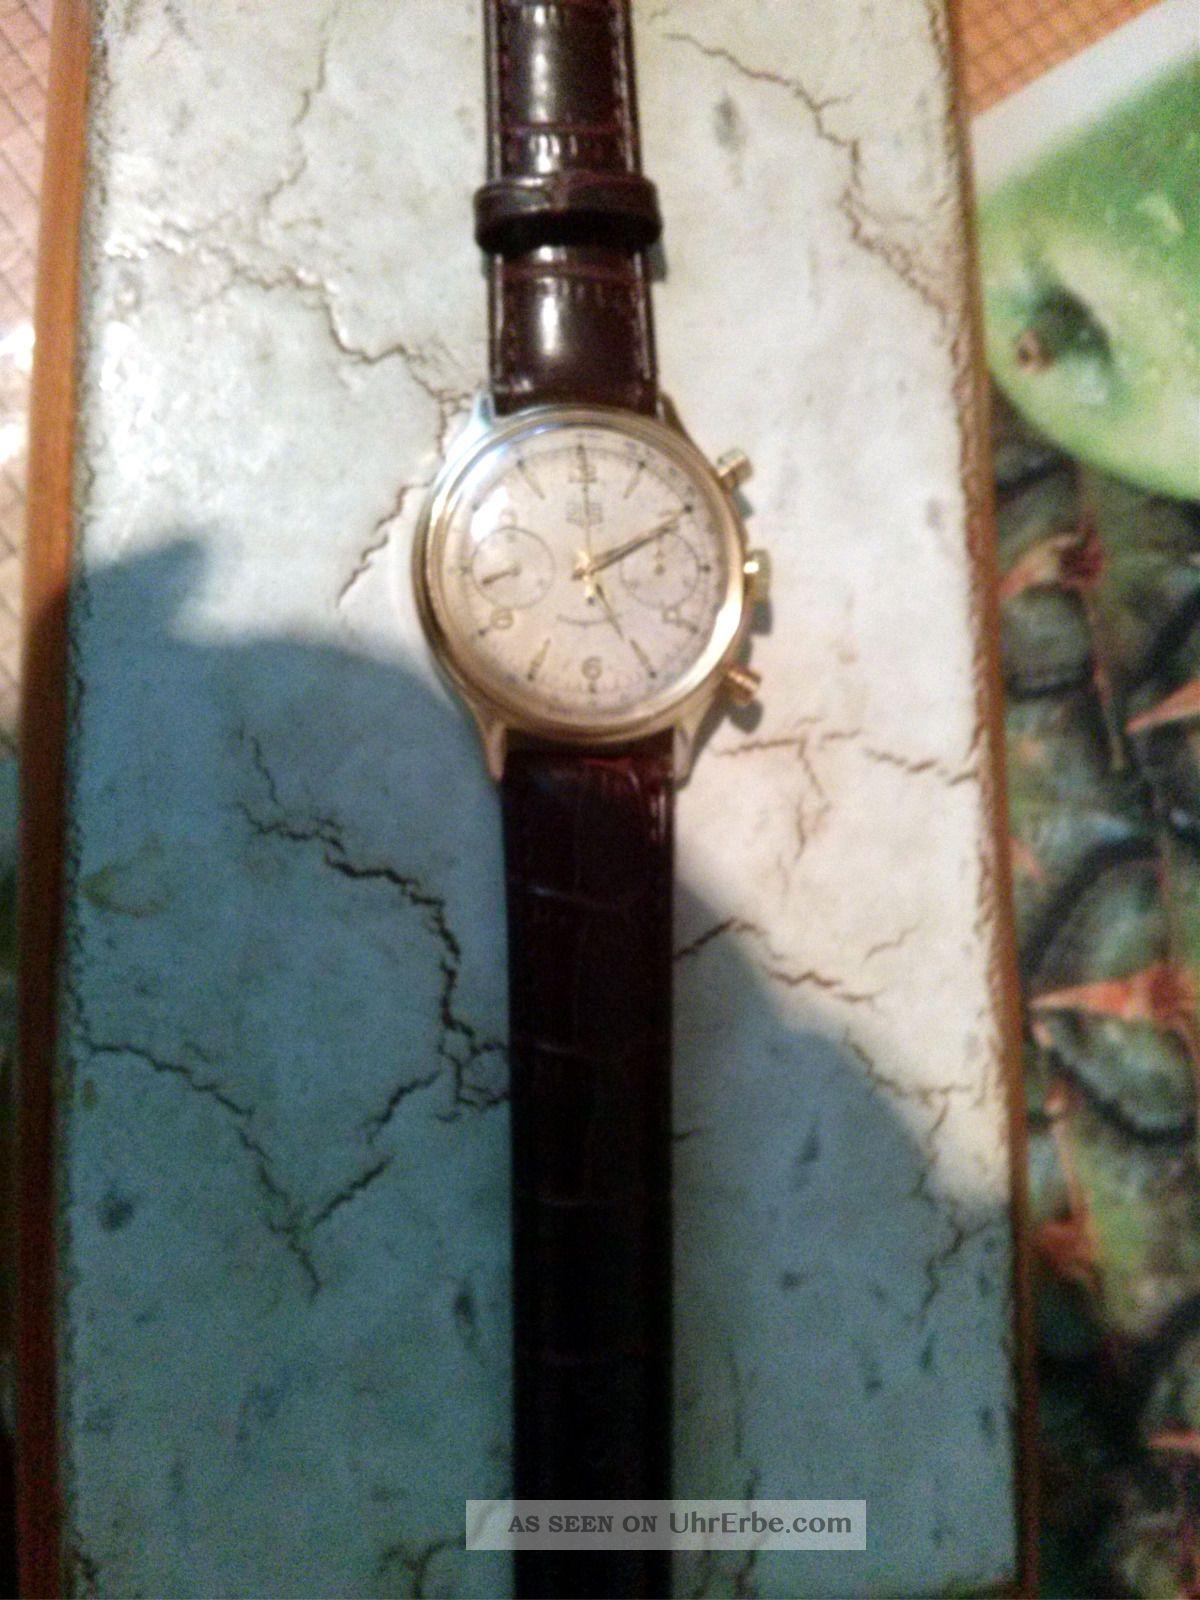 Gub Glashütte Chronograph Kaliber 64 Armbanduhren Bild